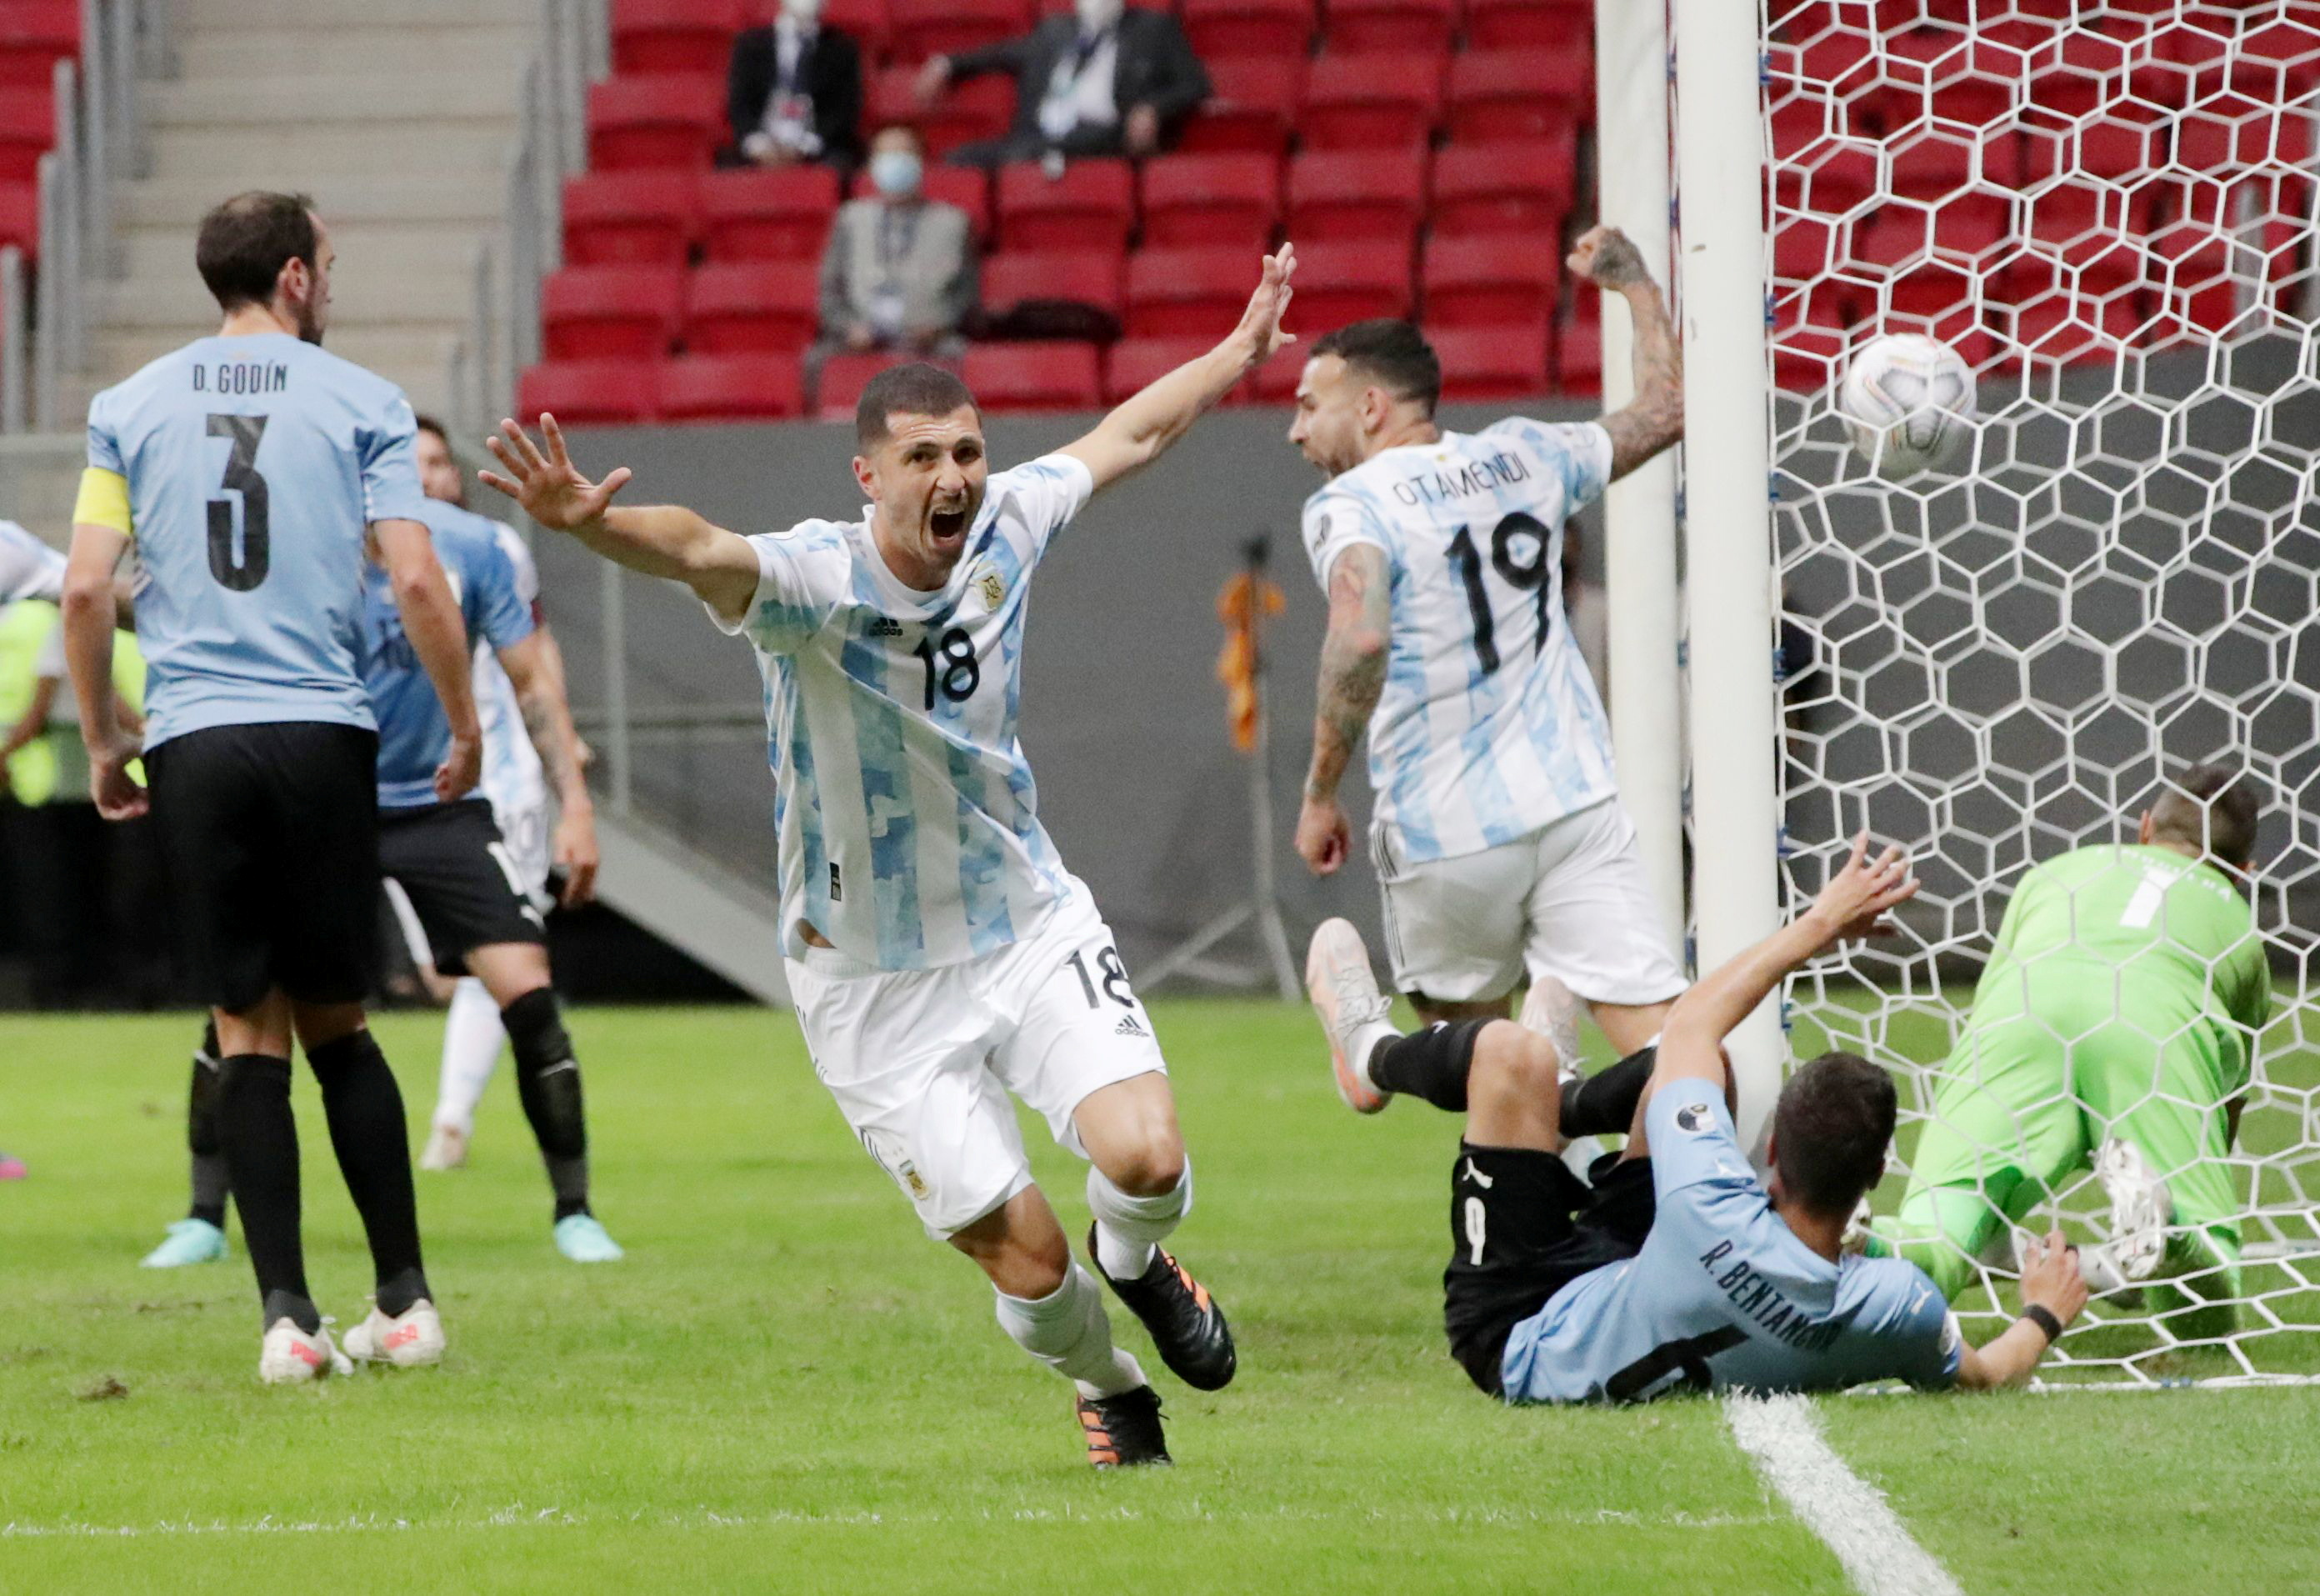 Soccer Football - Copa America 2021 - Group A - Argentina v Uruguay - Estadio Mane Garrincha, Brasilia, Brazil - June 18, 2021 Argentina's Guido Rodriguez celebrates scoring their first goal REUTERS/Henry Romero